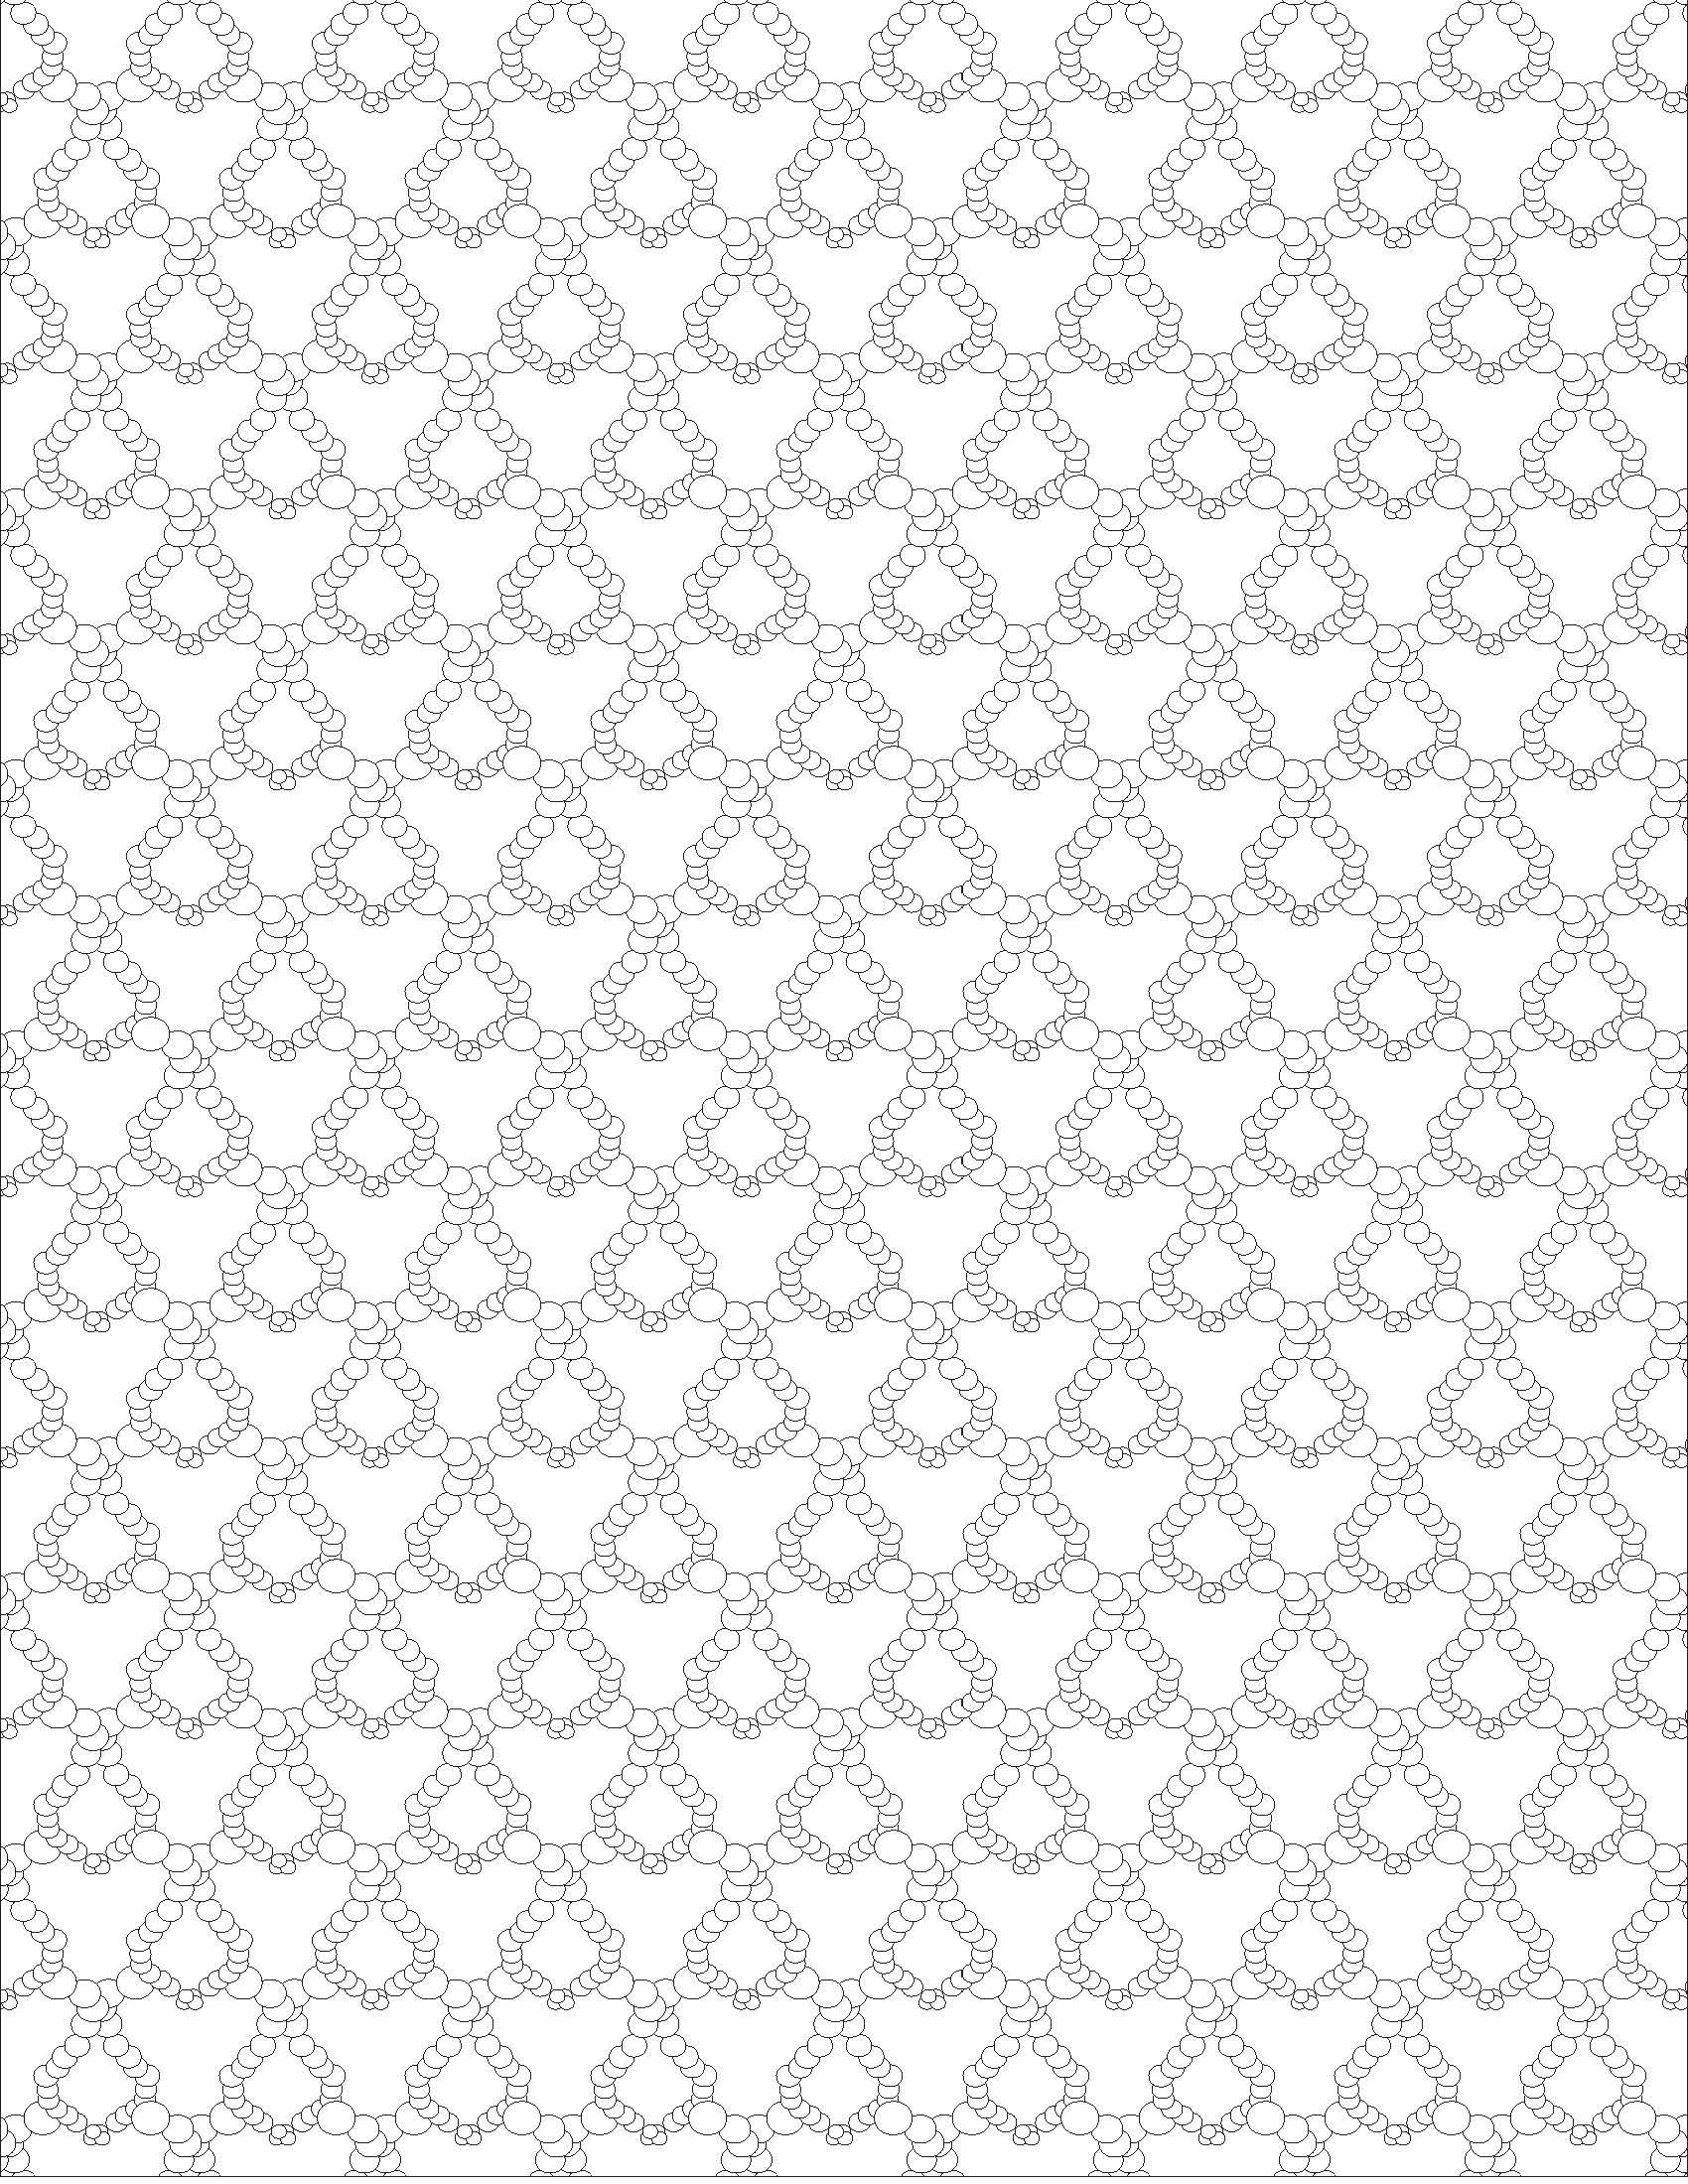 b&W Templates_Page_8.jpg